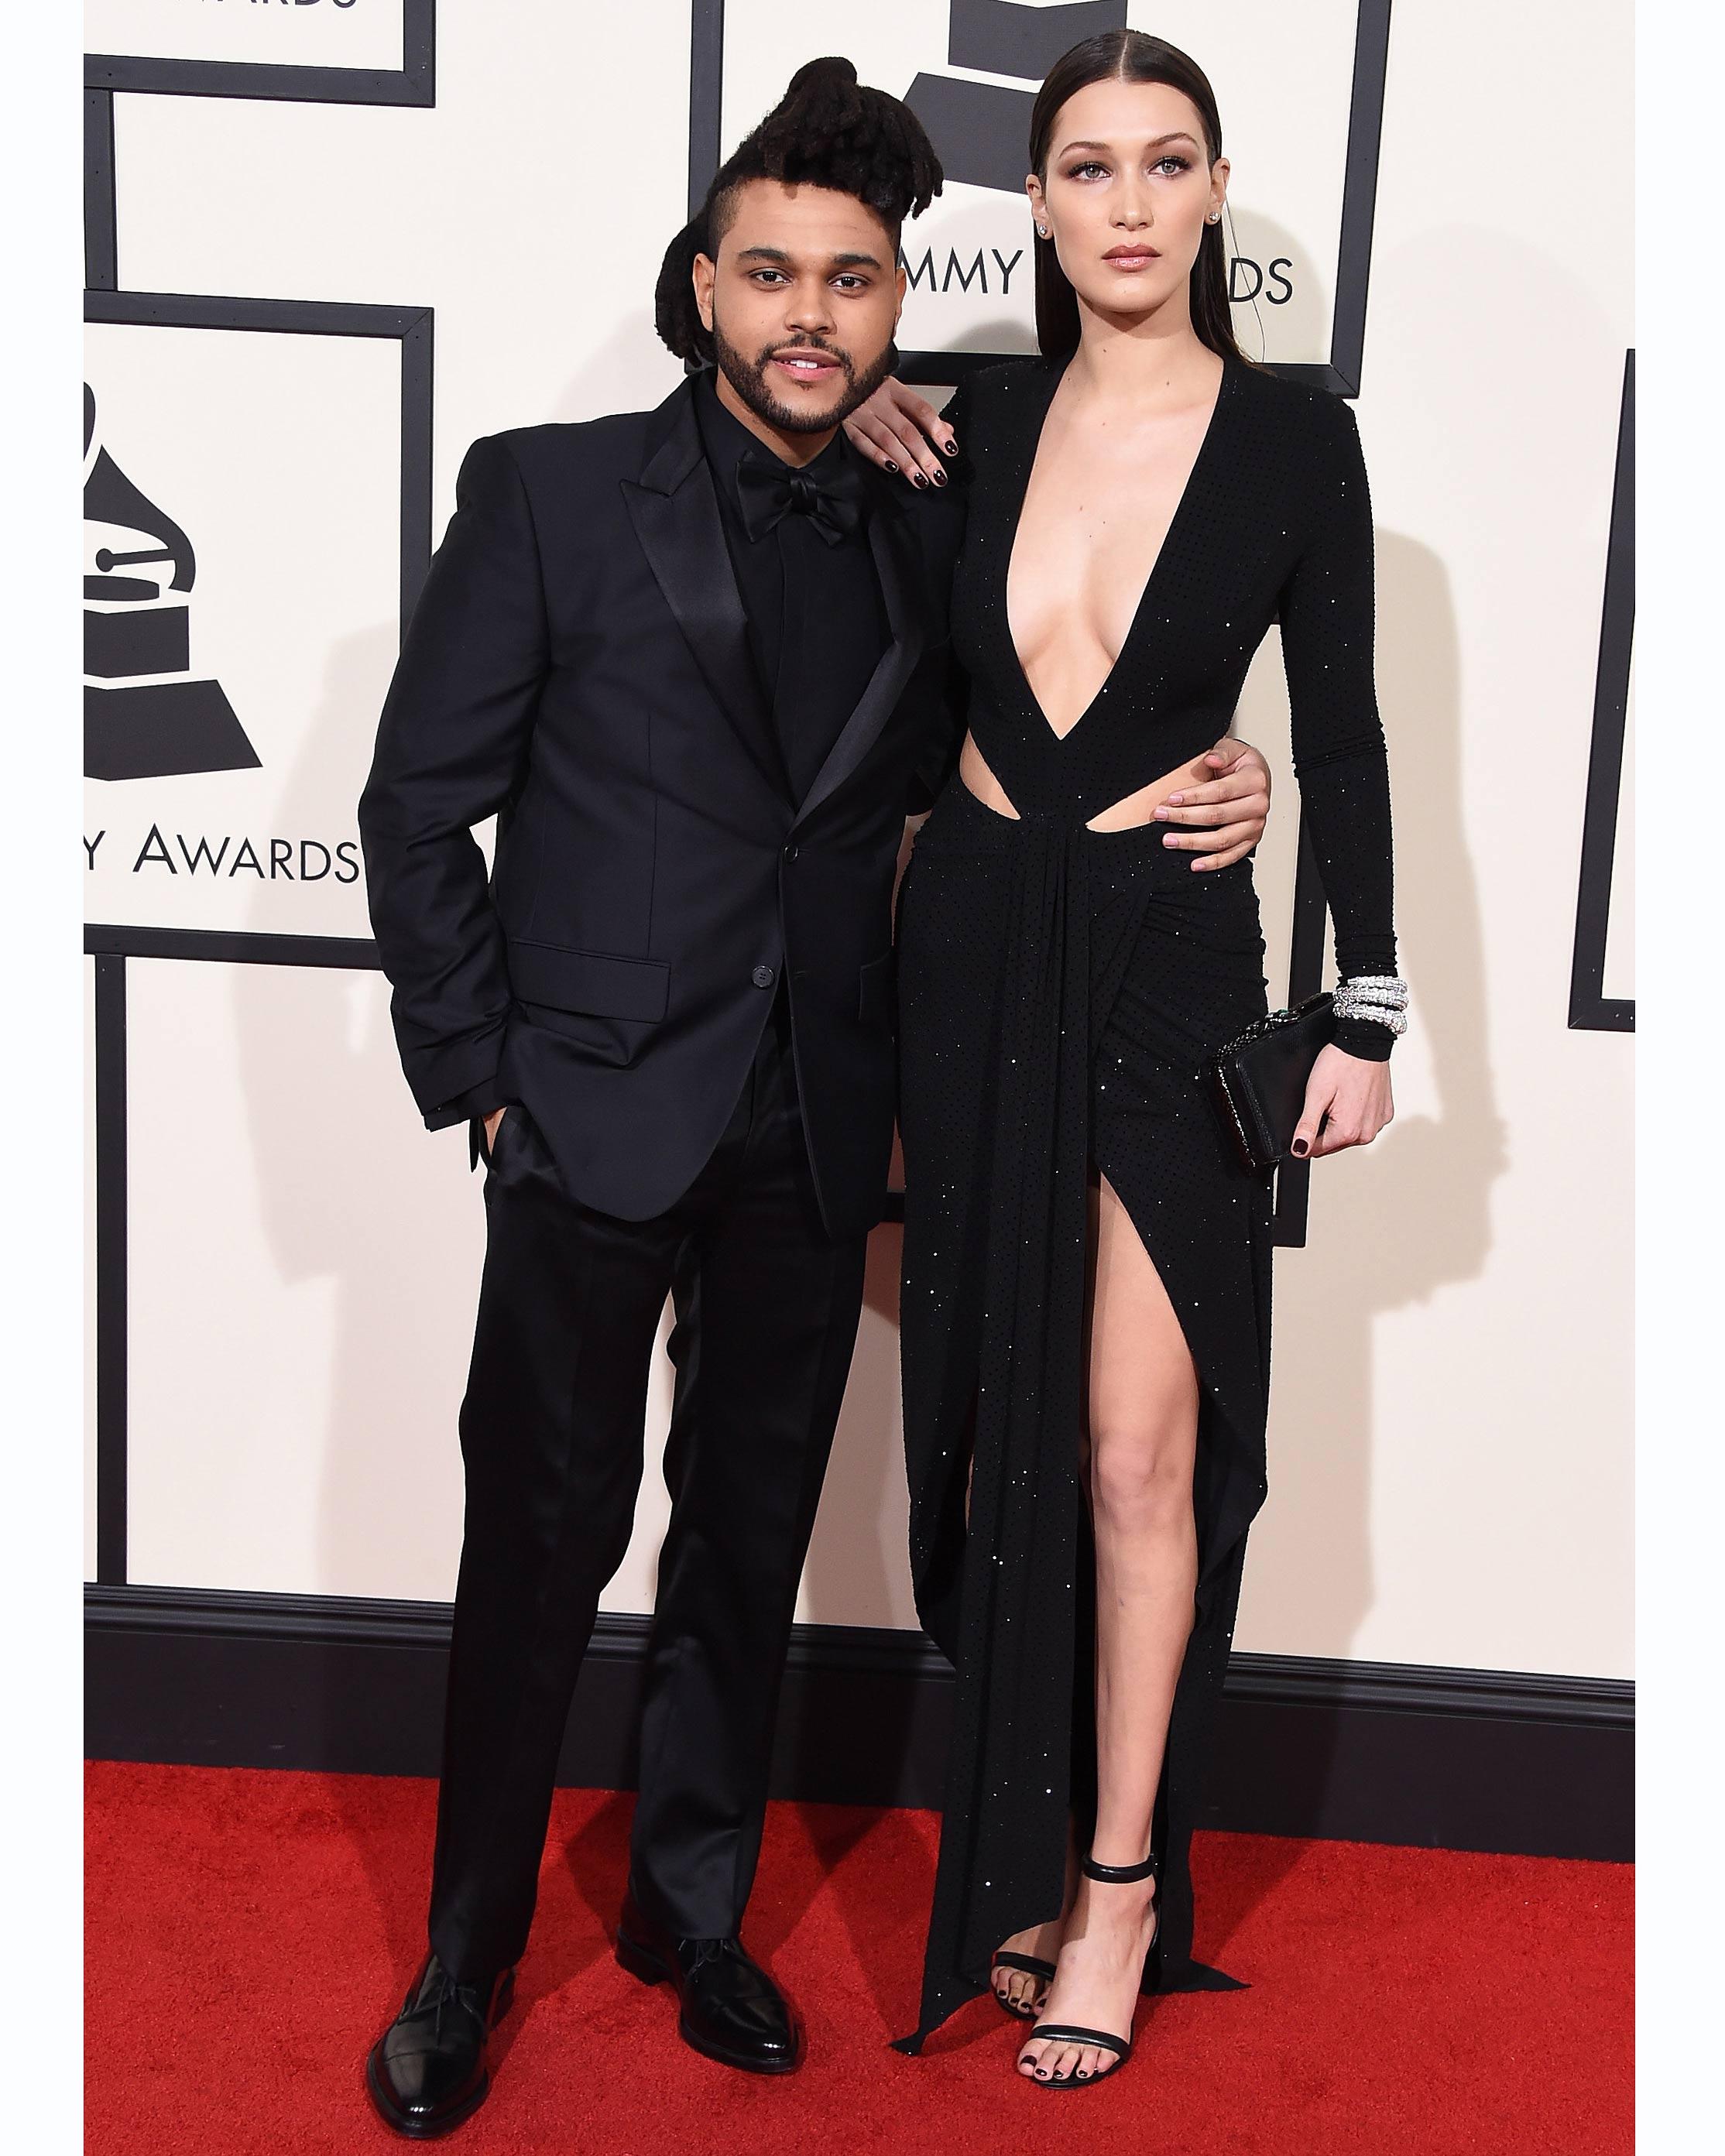 grammy-awards-2016-cutest-couples-the-weeknd-bella-hadid-0216.jpg